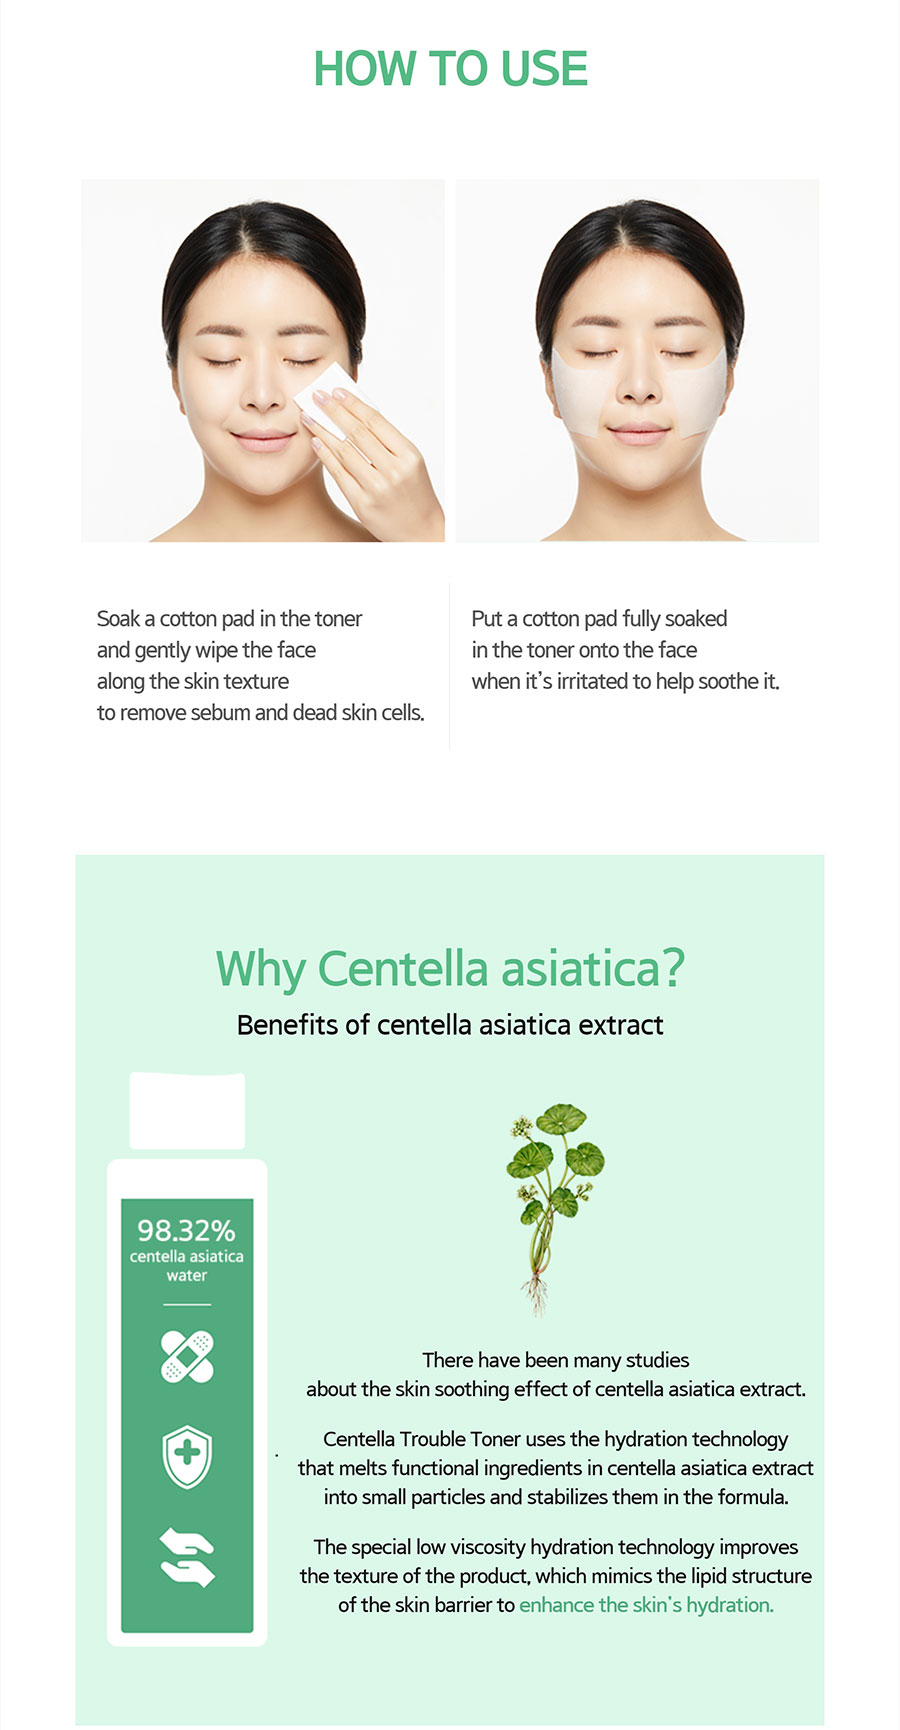 Centella Trouble Toner - How to use